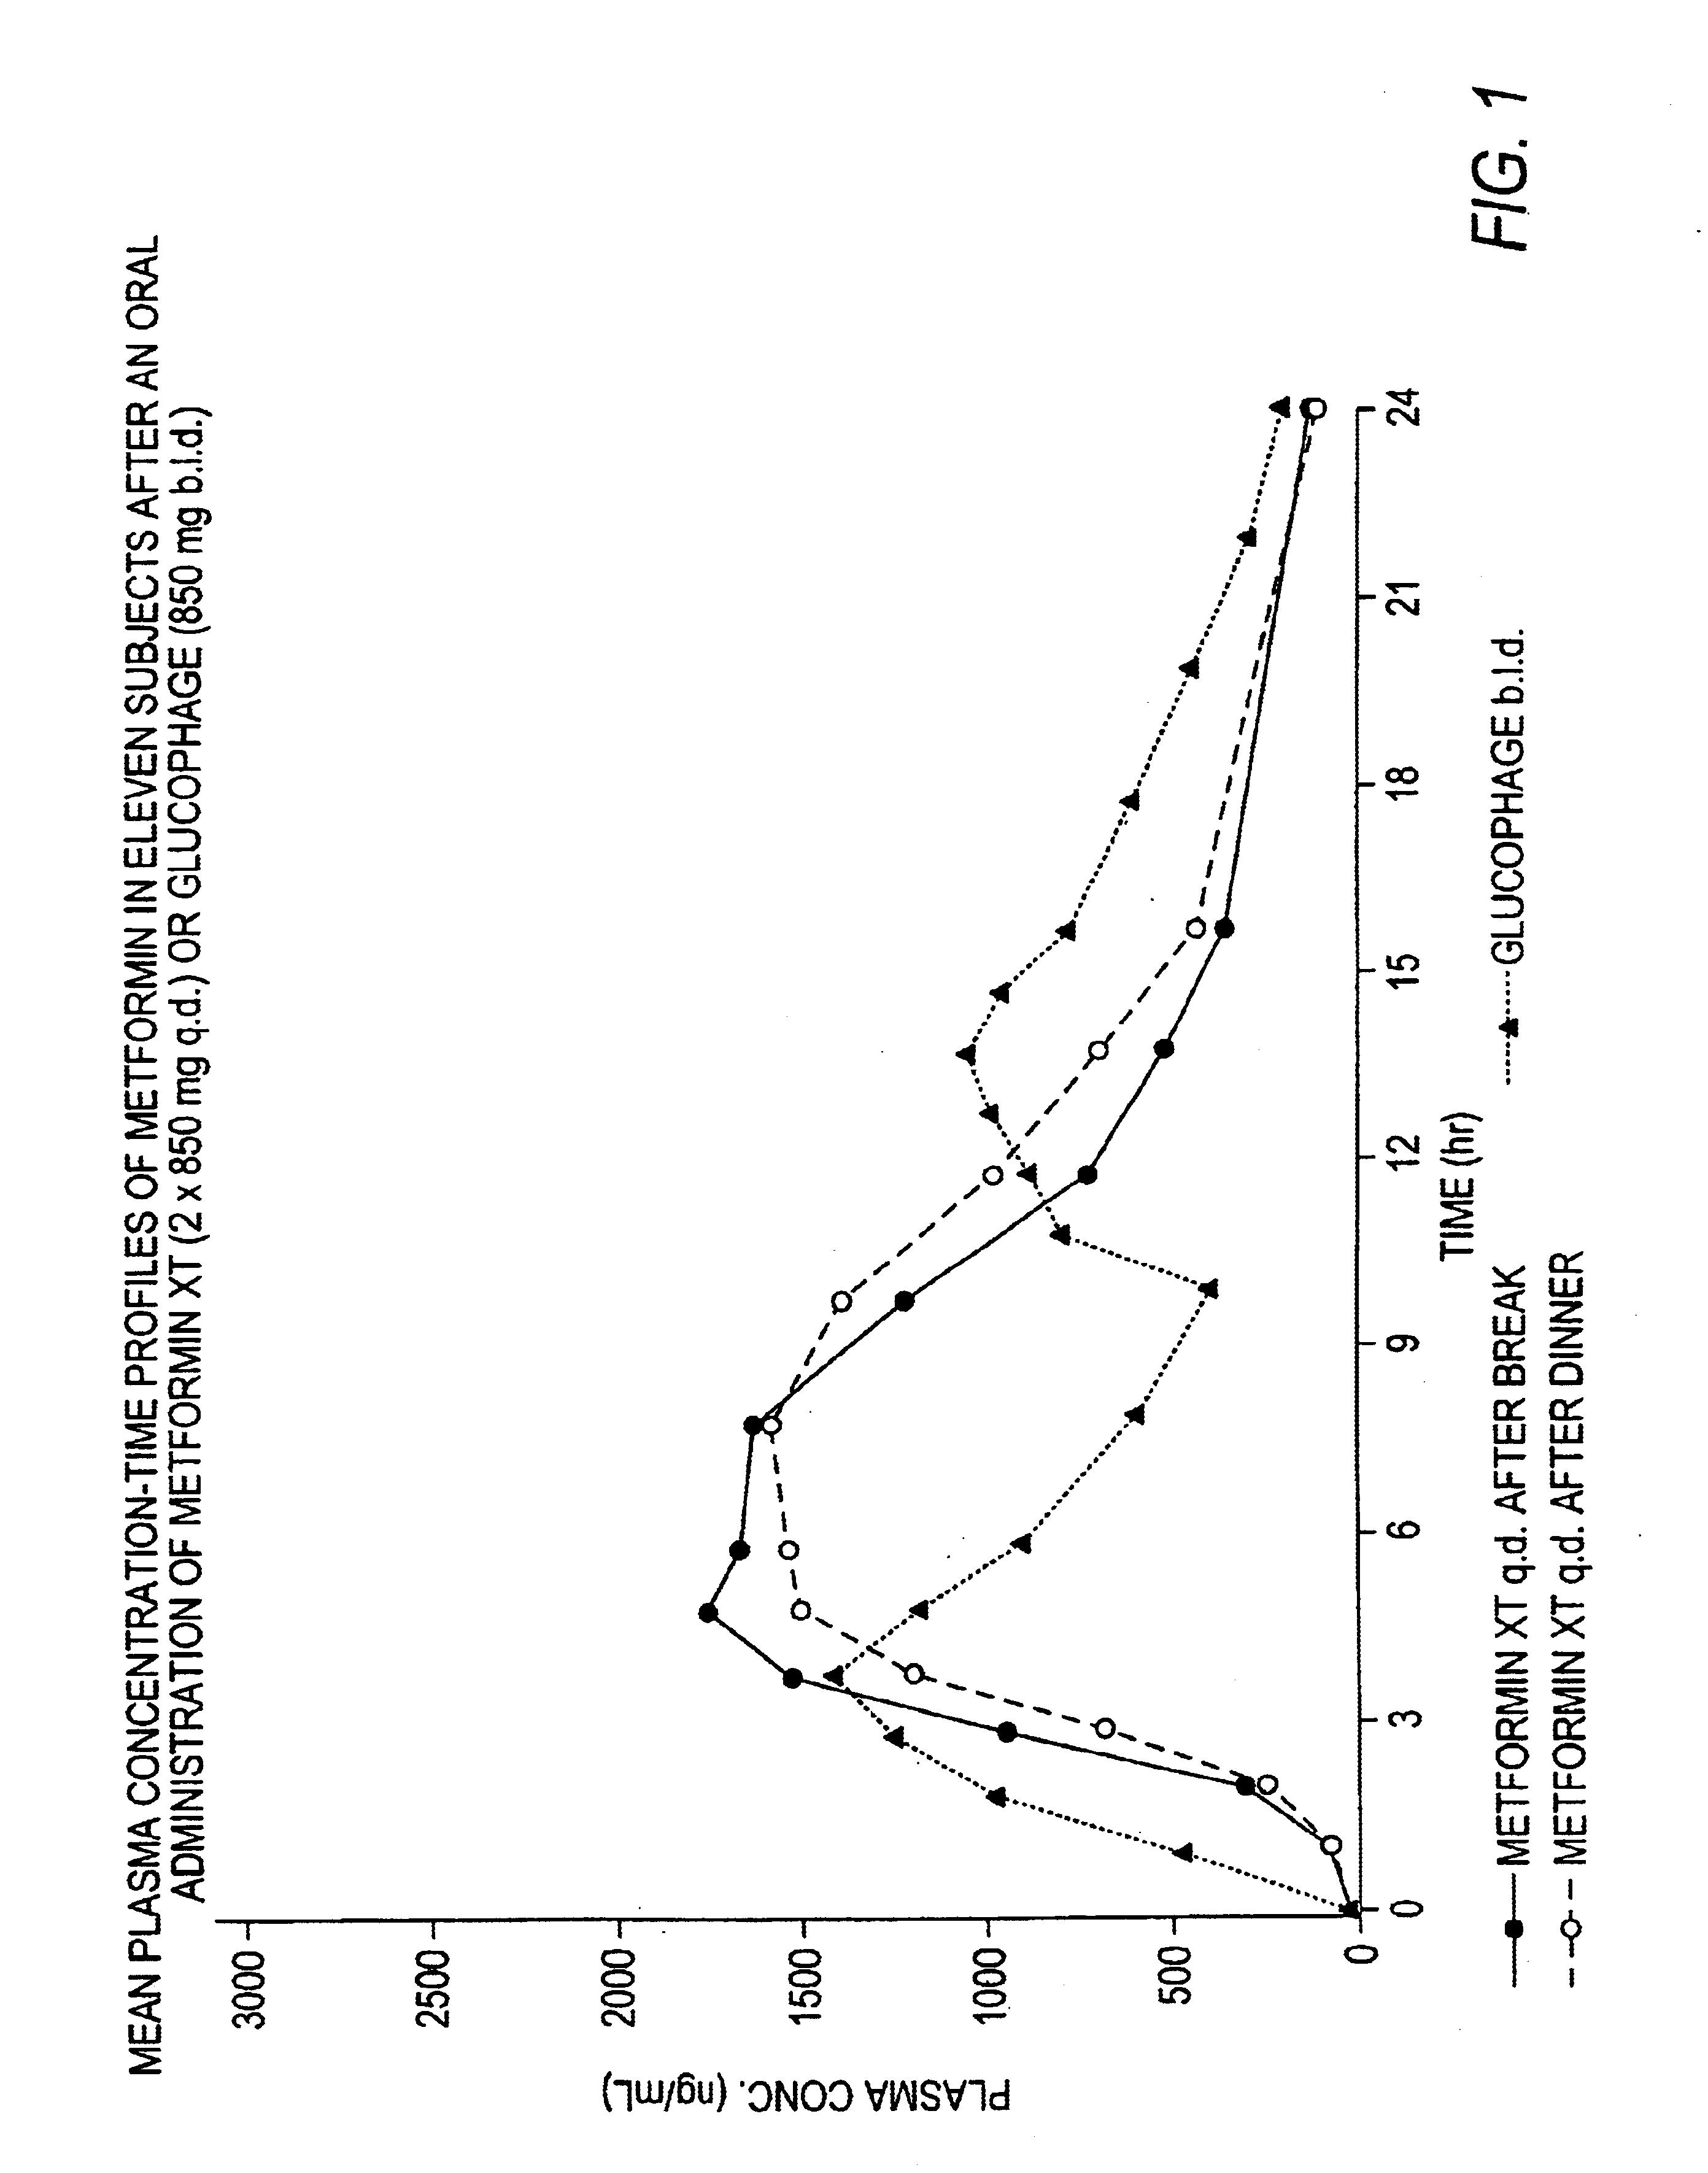 Glucophage 1000 mg tab.doc - Patent Drawing